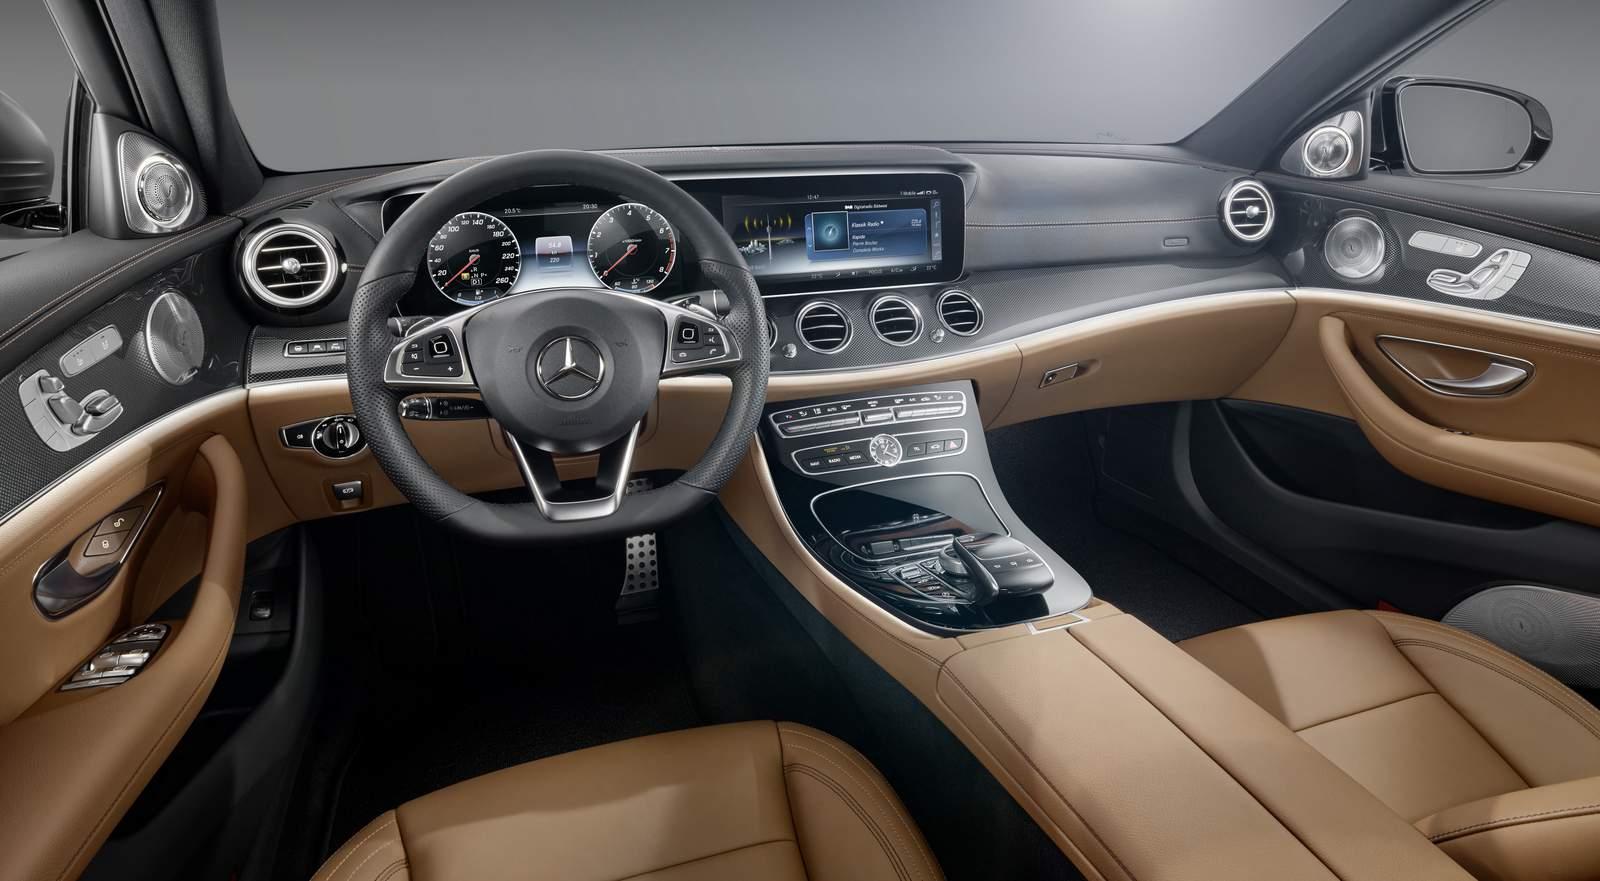 Novo Mercedes-Benz Classe E 2016 - interior